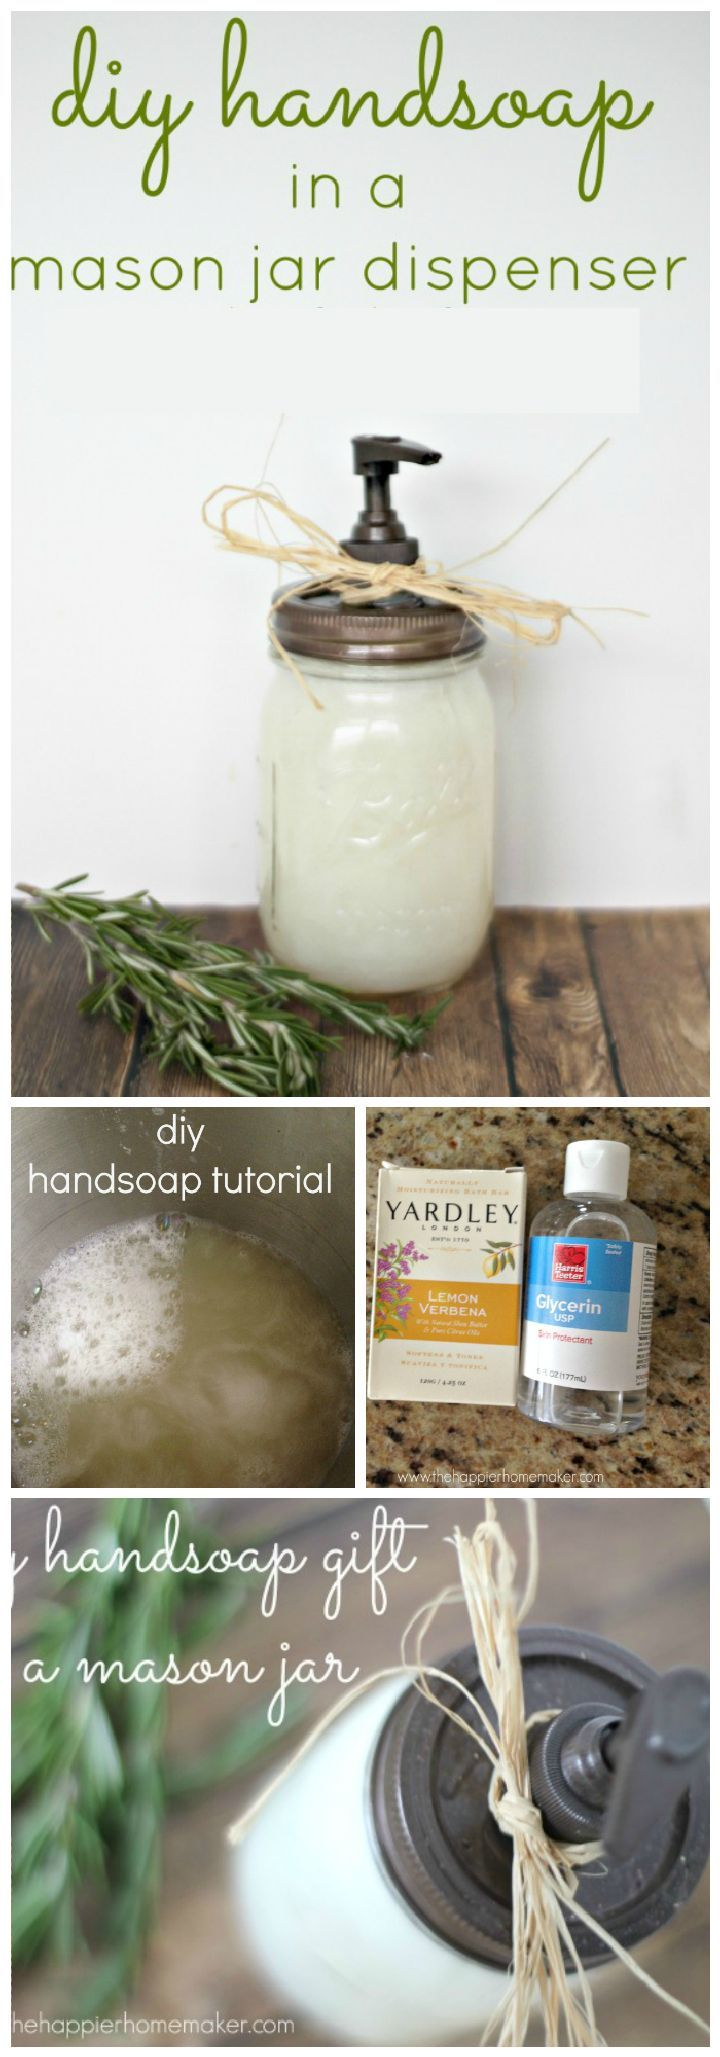 Hand Soap In A Mason Jar Dispenser Gift - 35 Unique DIY Mason Jar Gifts for Everyone - I Heart Crafty